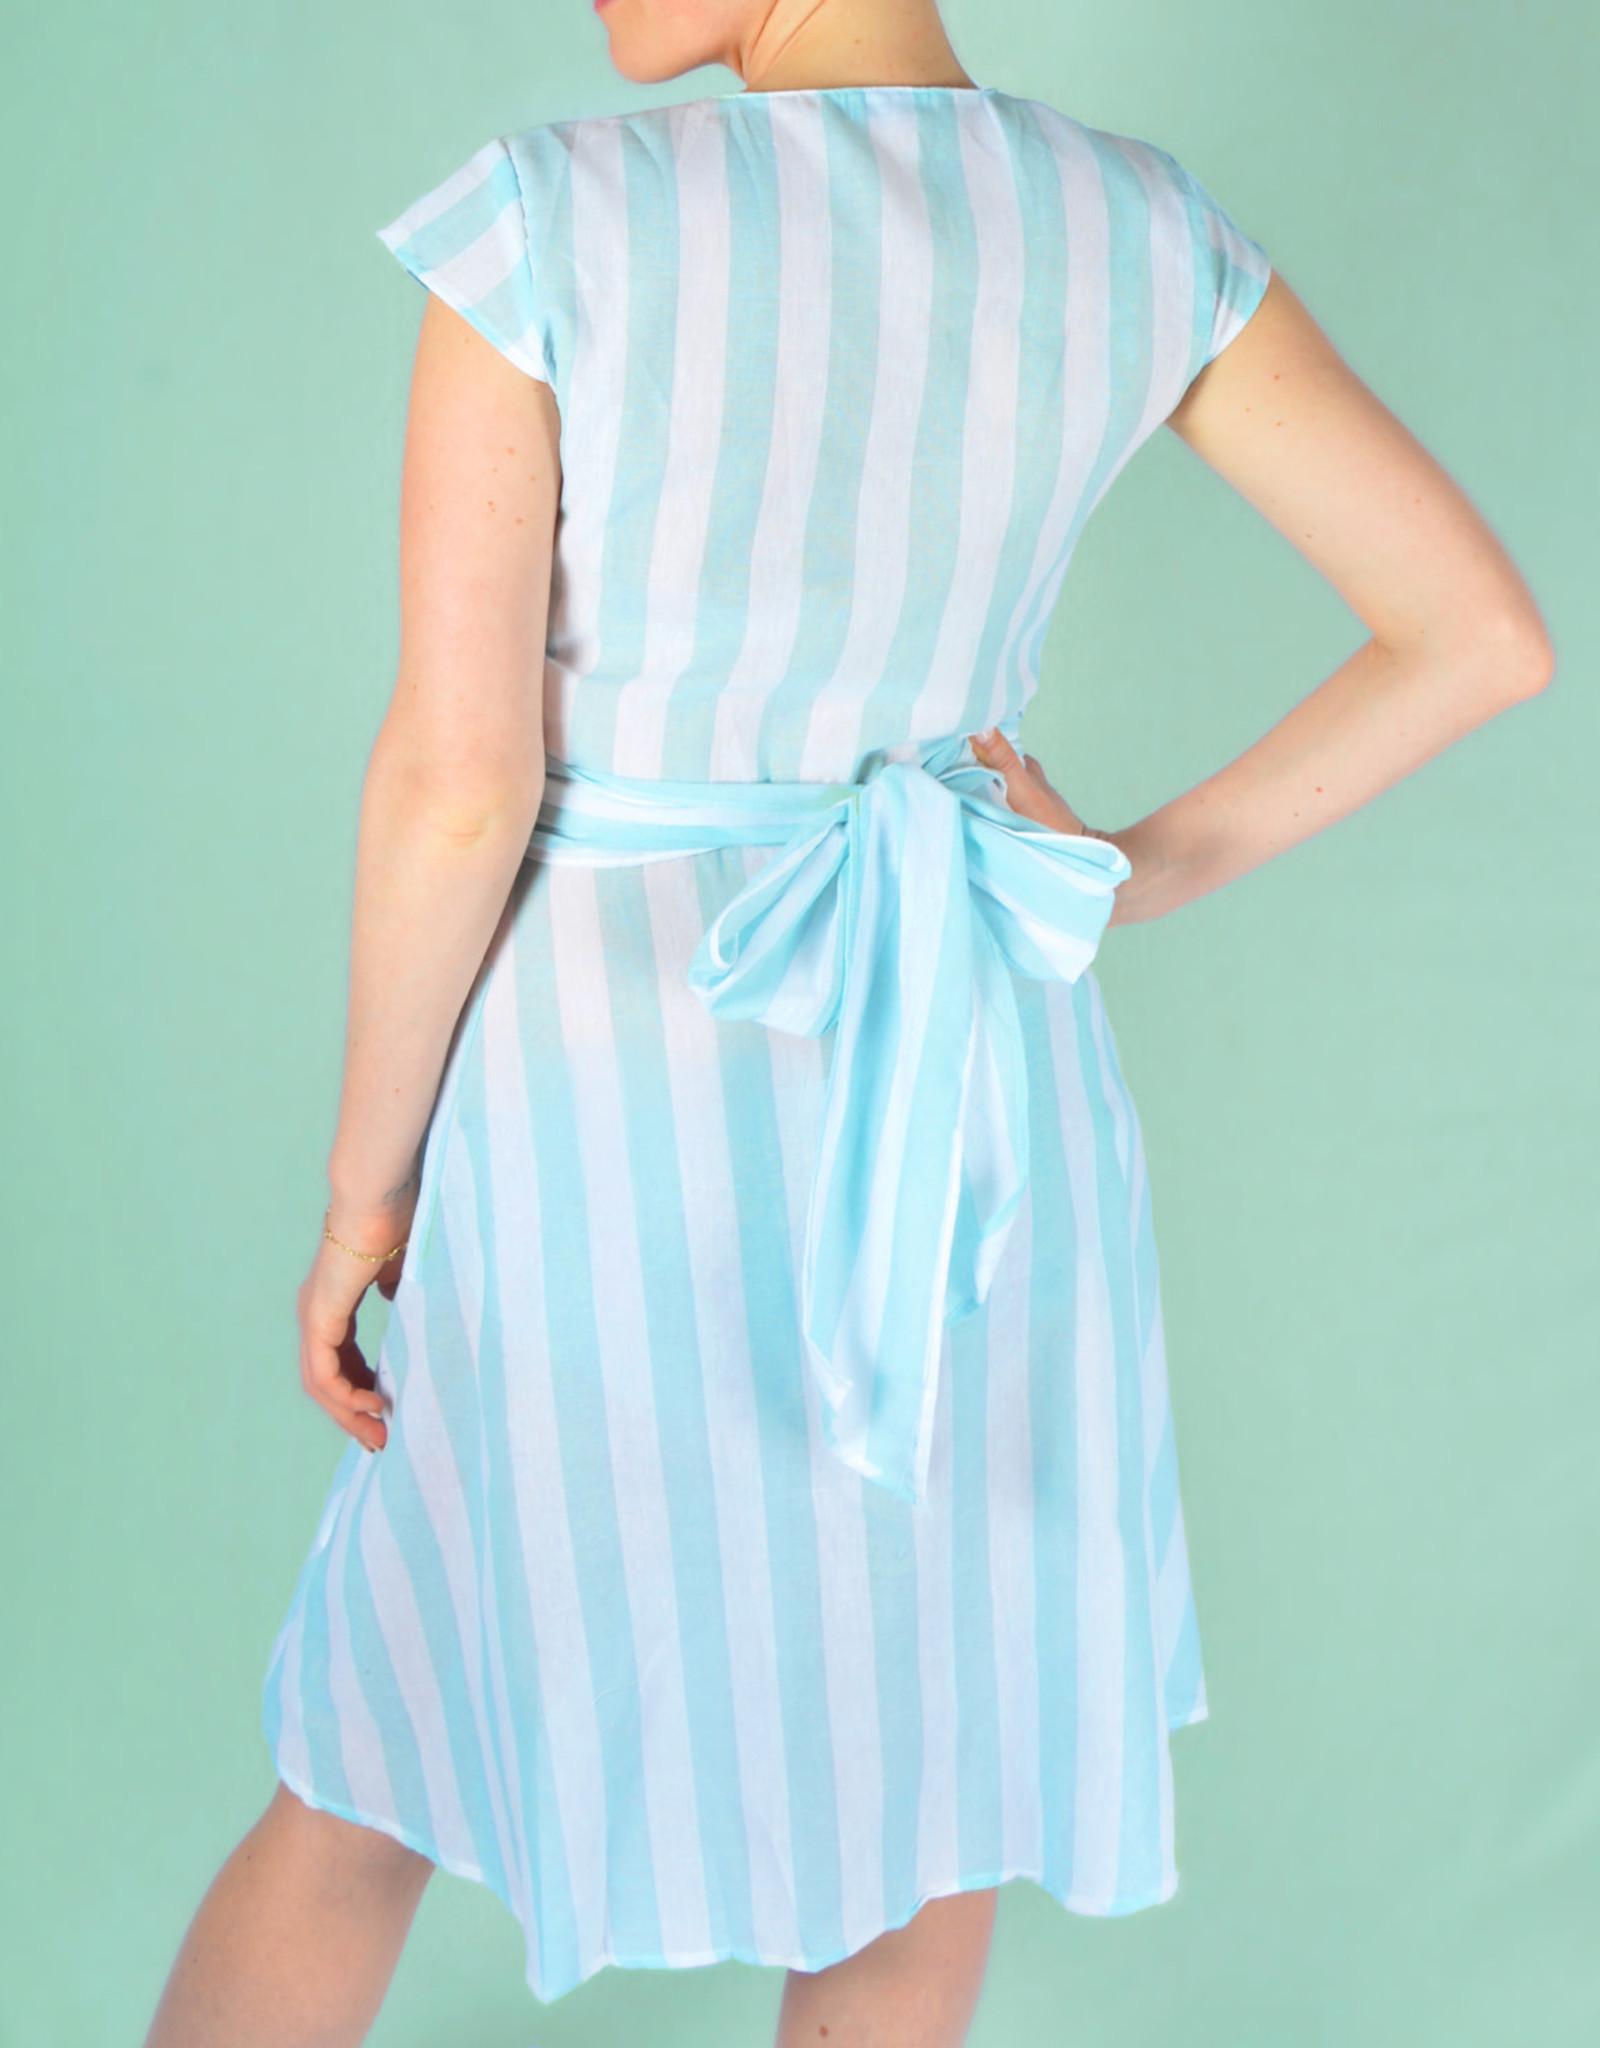 Green striped dress